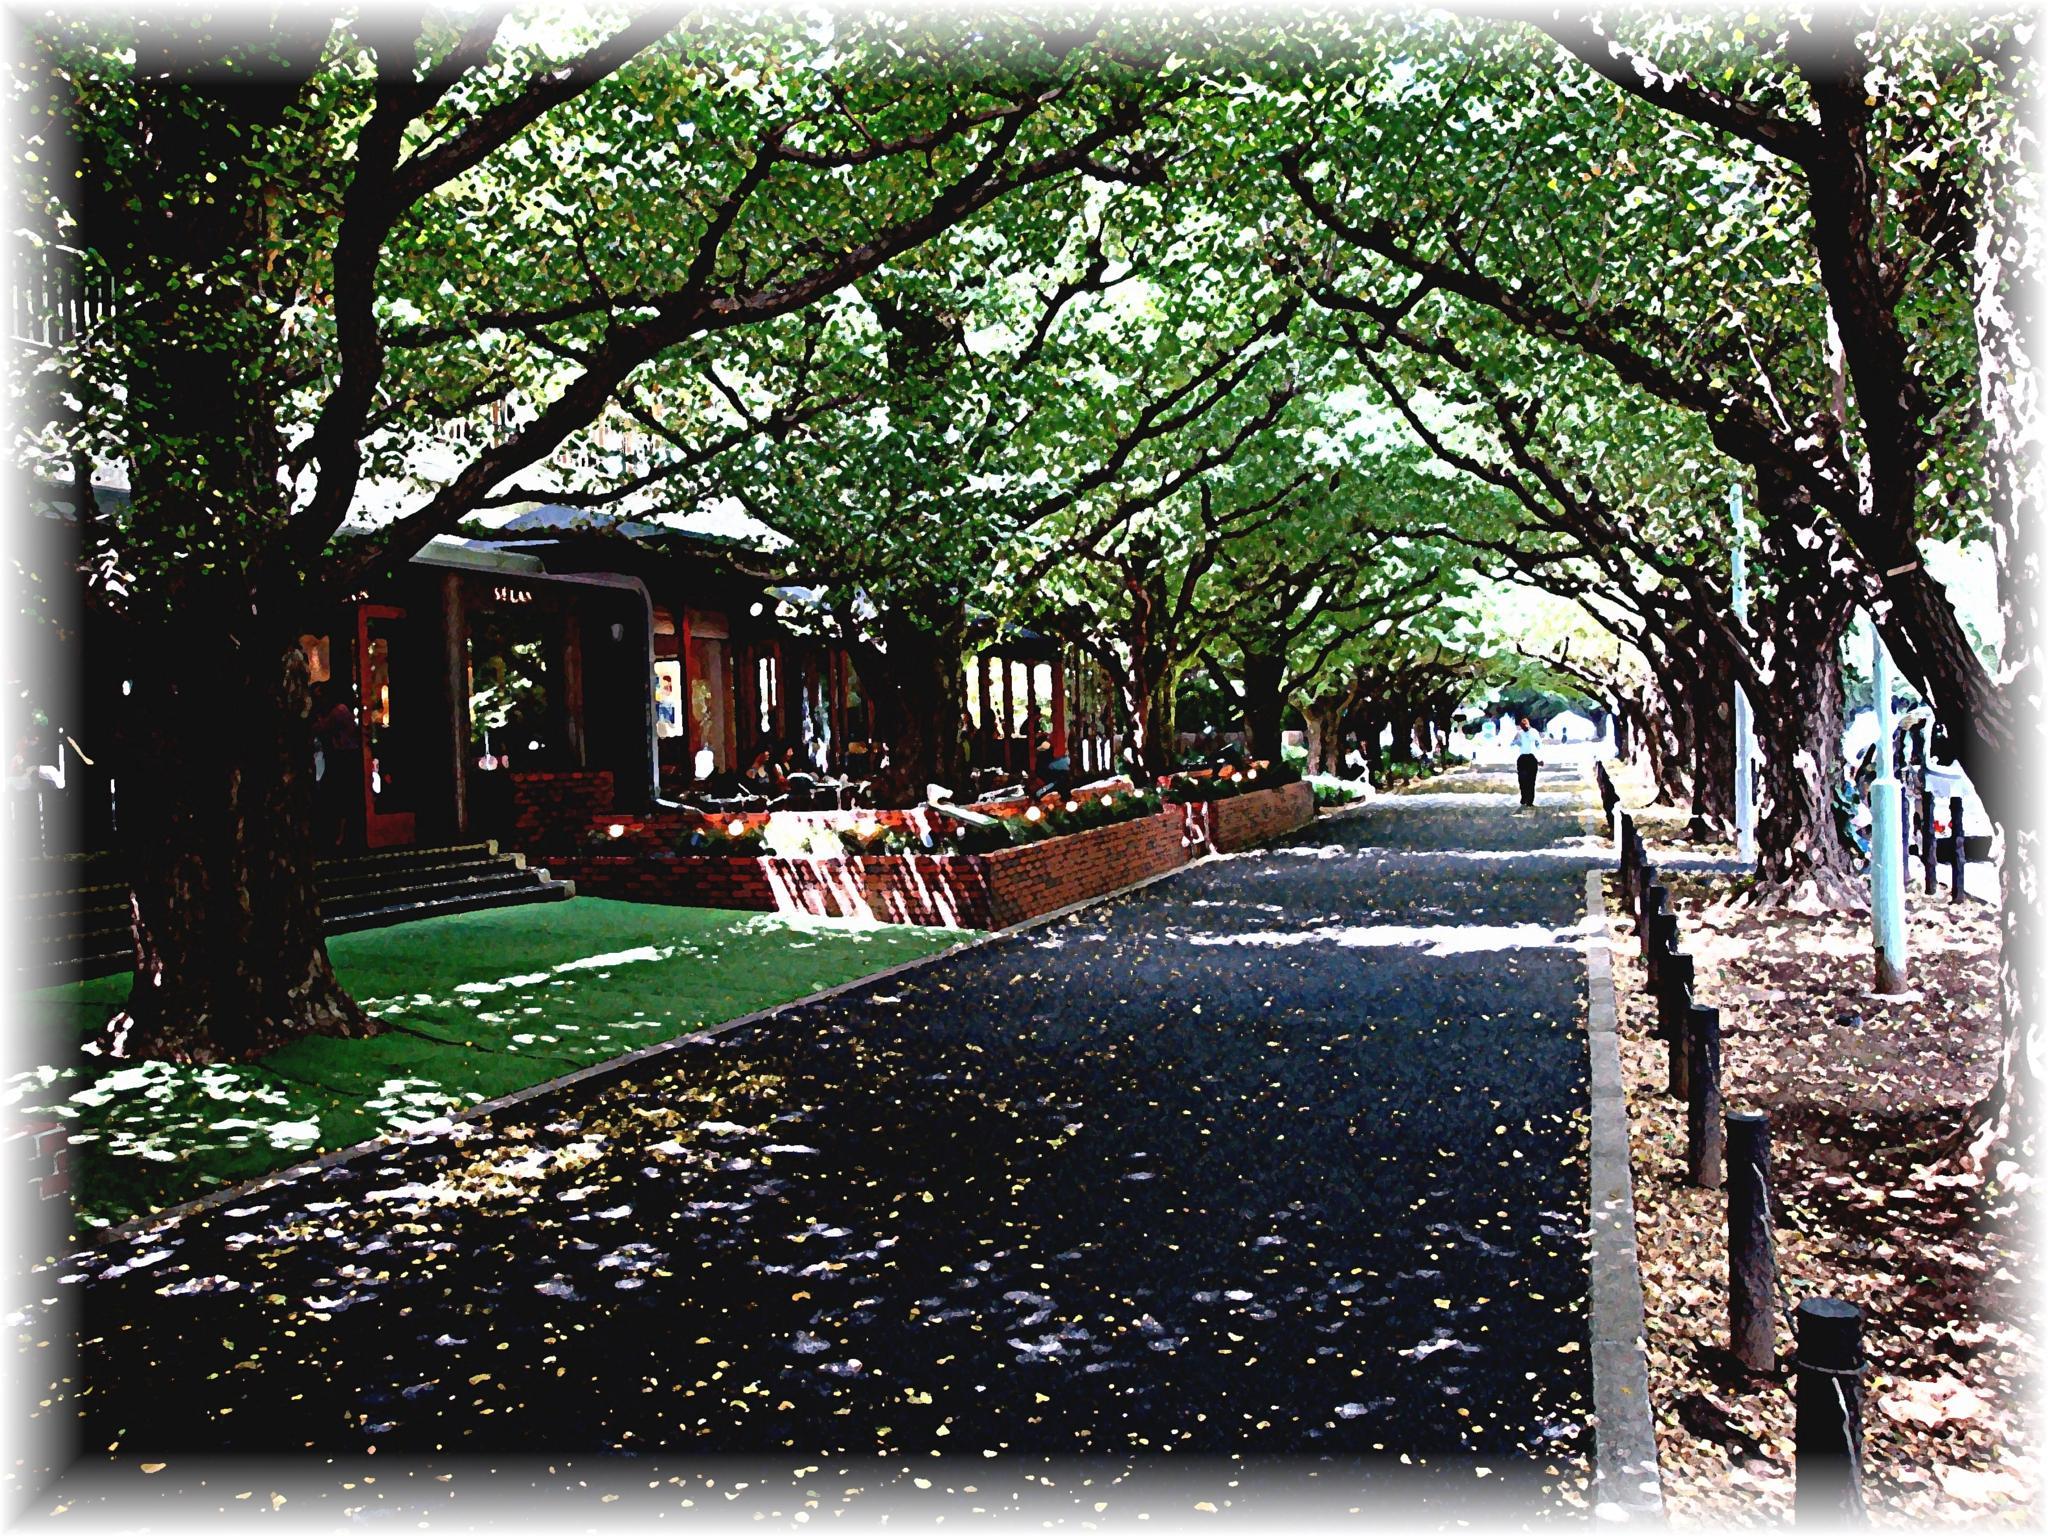 Shaded Street by Joeski